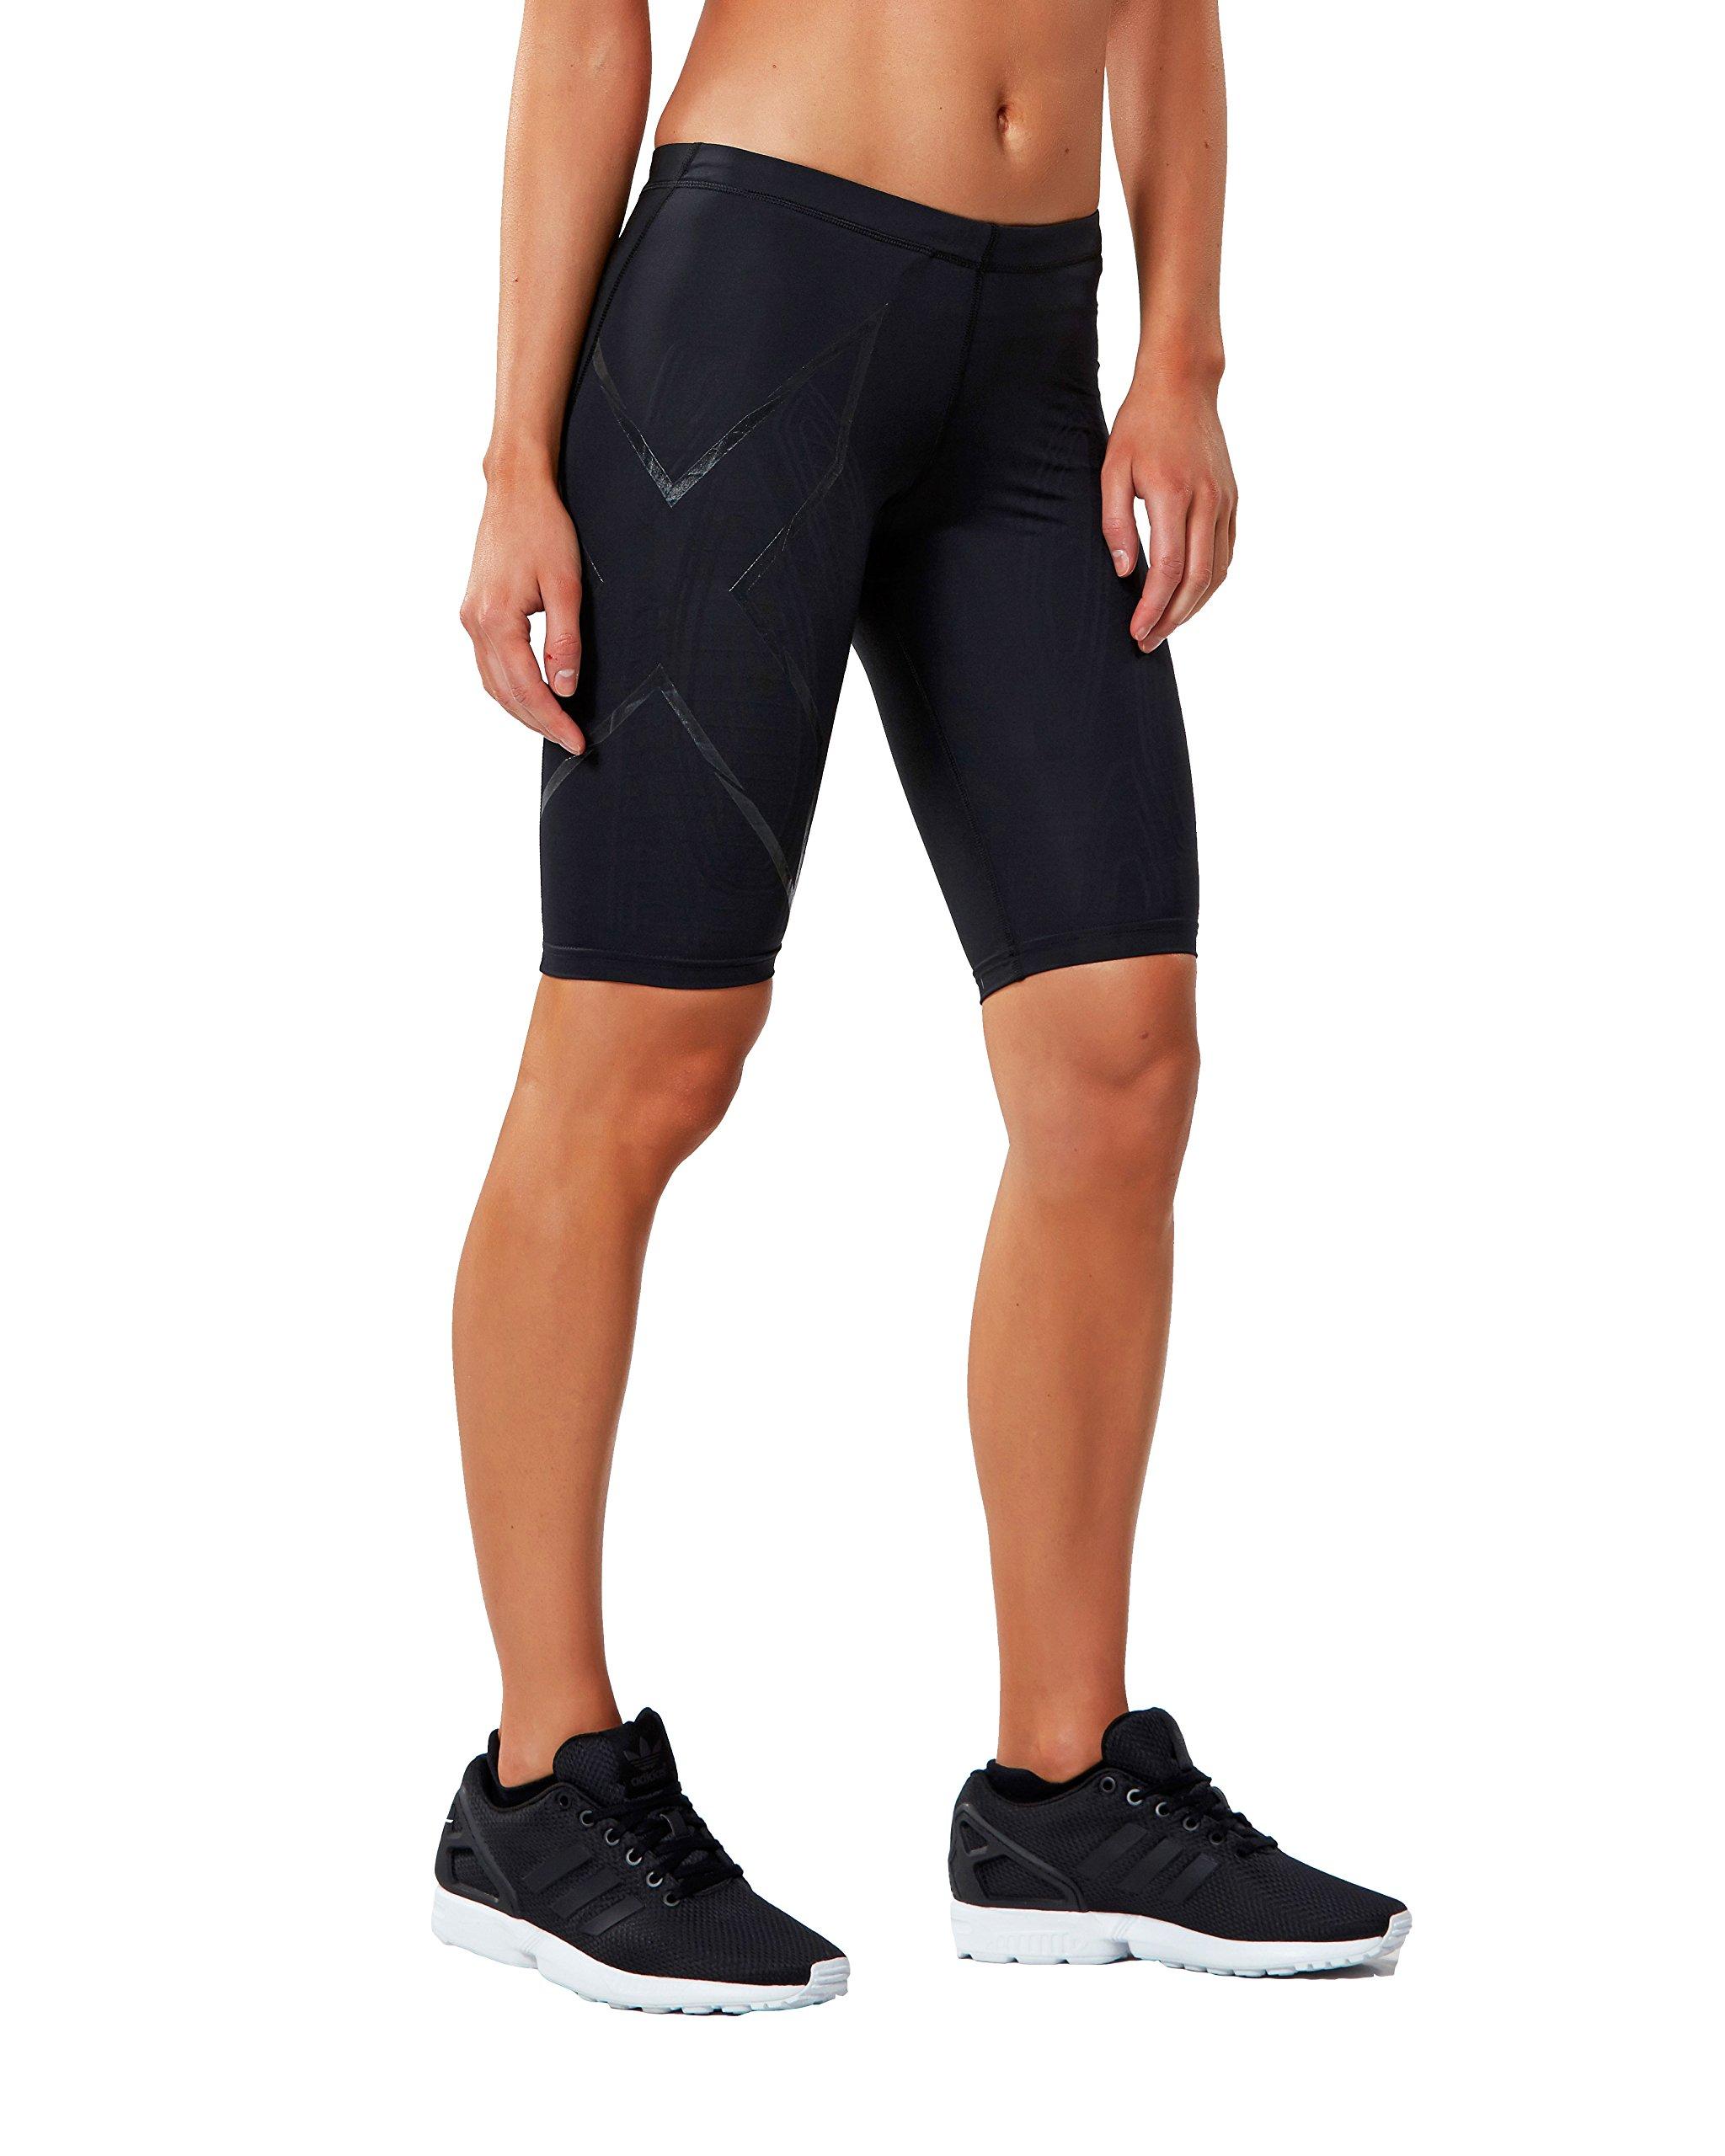 2XU Women's Elite MCS Compression Shorts, Black/Nero, Large